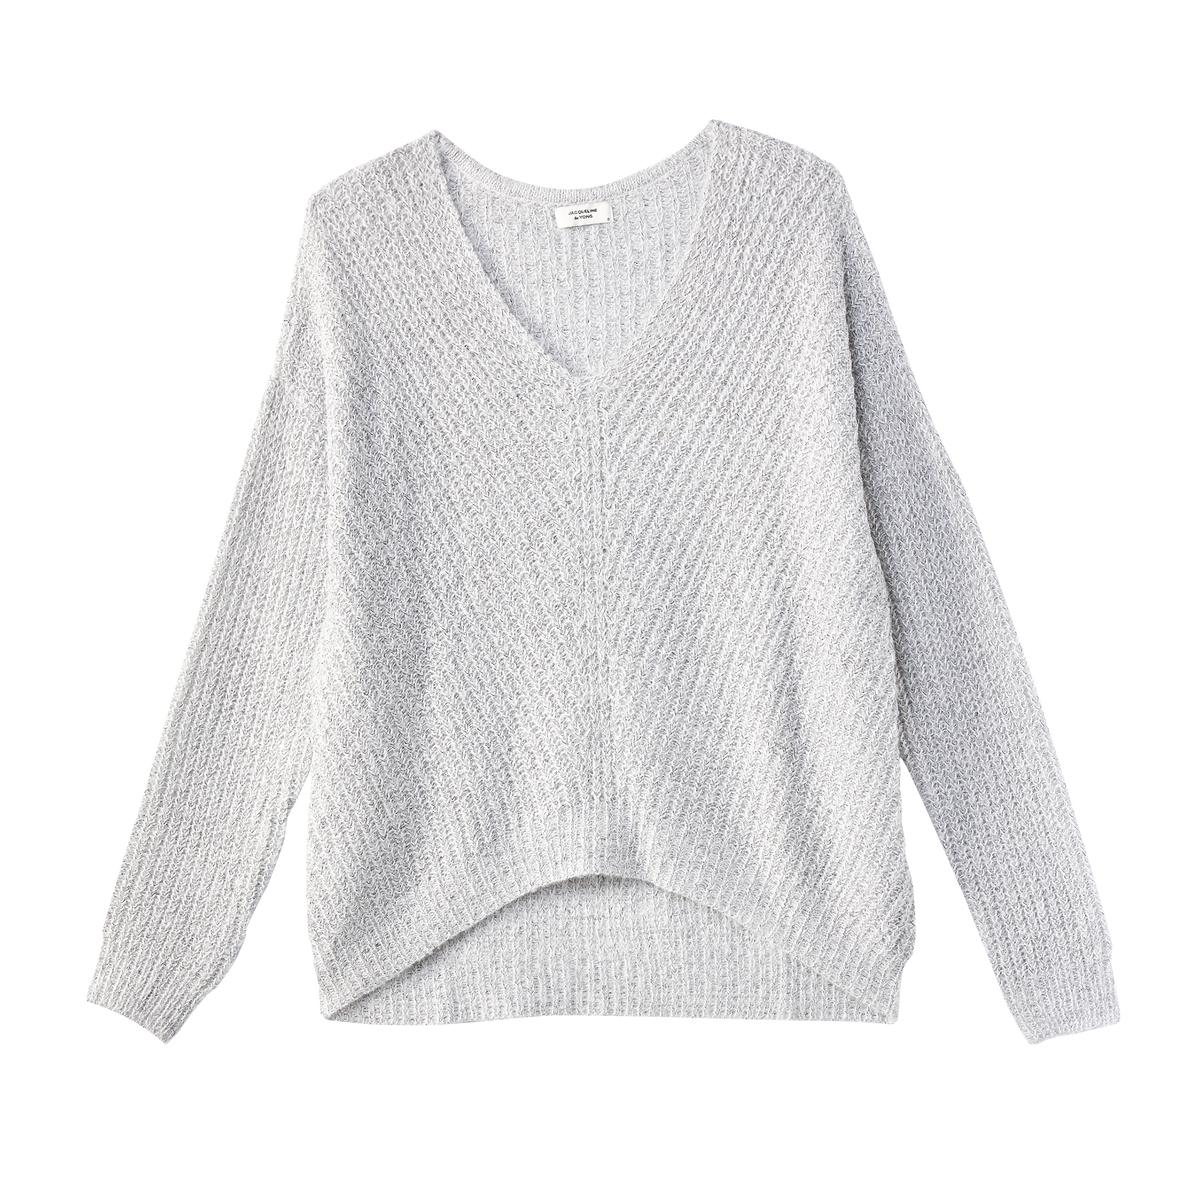 Пуловер Jacqueline de Yong 15522782 от LaRedoute